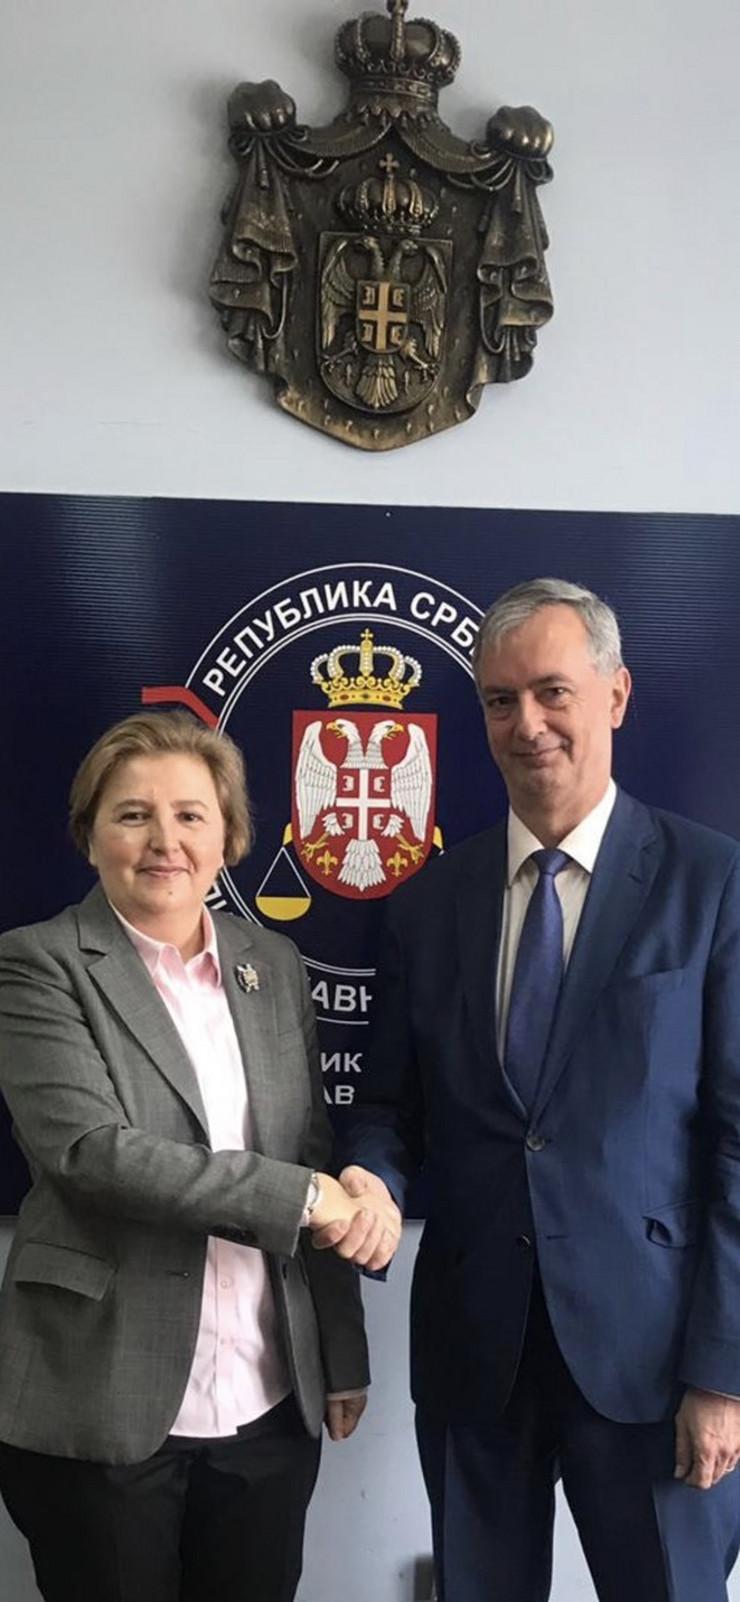 Republički javni tužilac Zagorka Dolovac i ambasador Kraljevine Belgije Koen Adam Promo